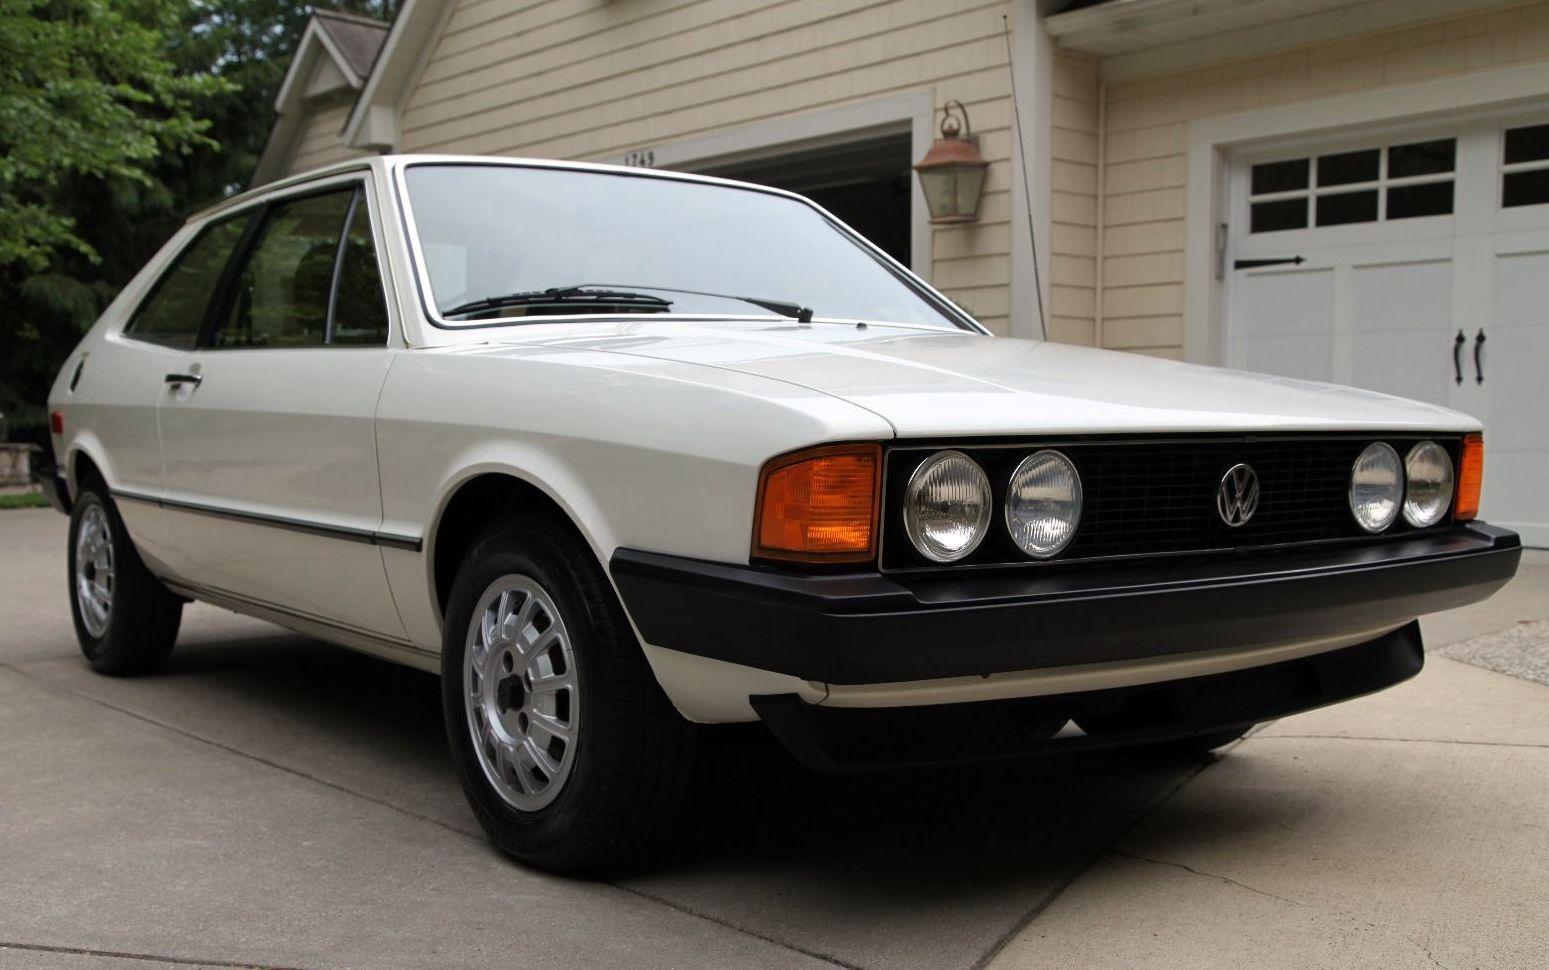 Car Paint For Sale >> Super Clean 1981 Volkswagen Scirocco